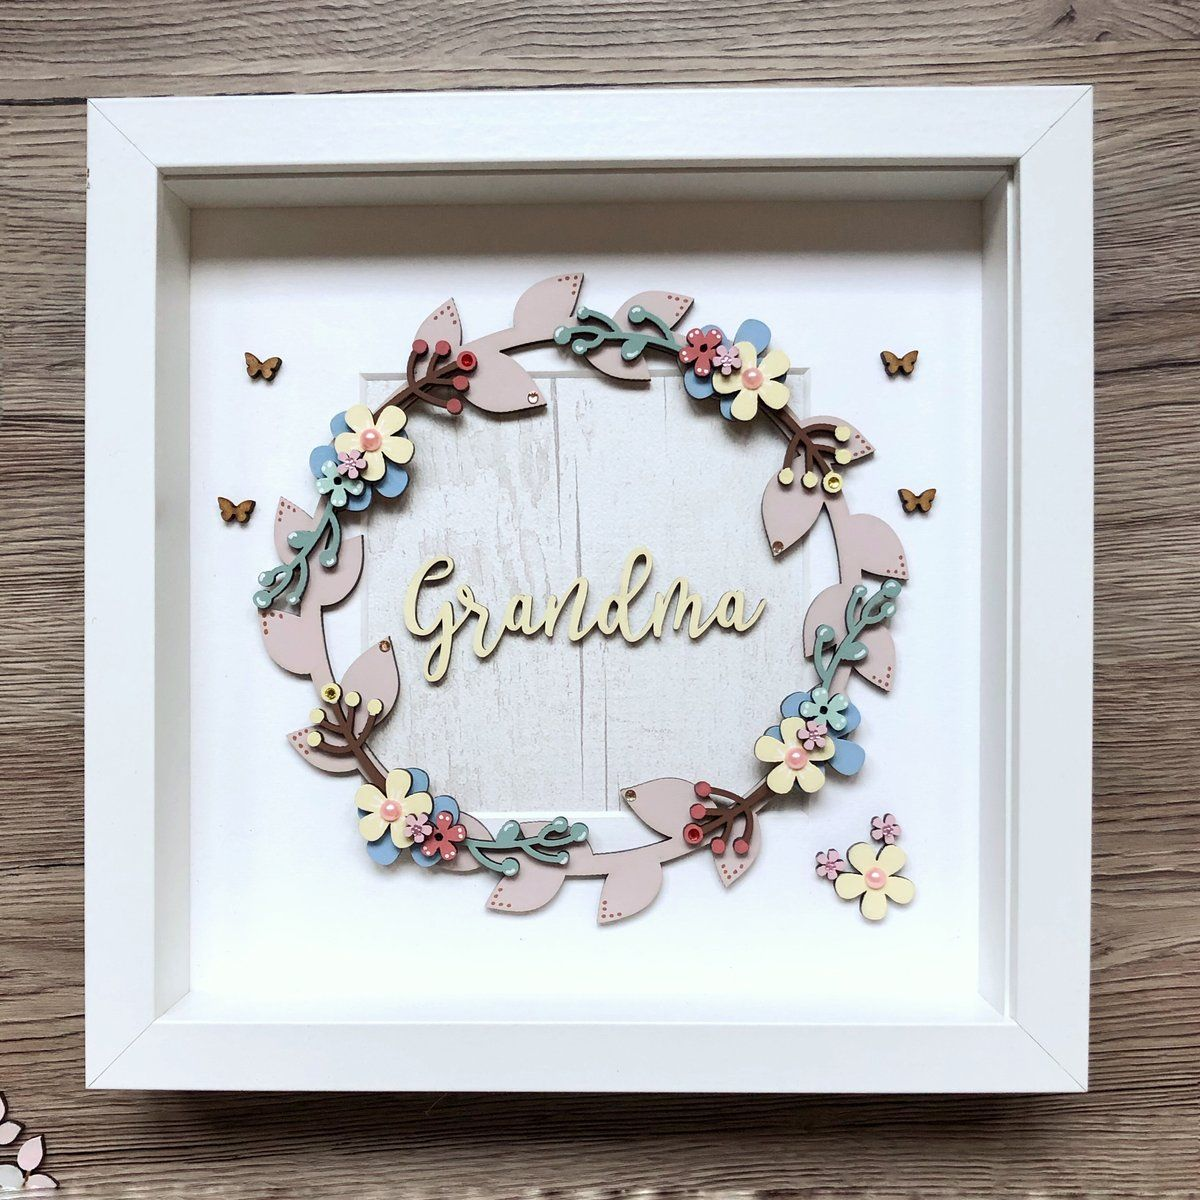 Grandma nana nan hand painted flower wreath frame all